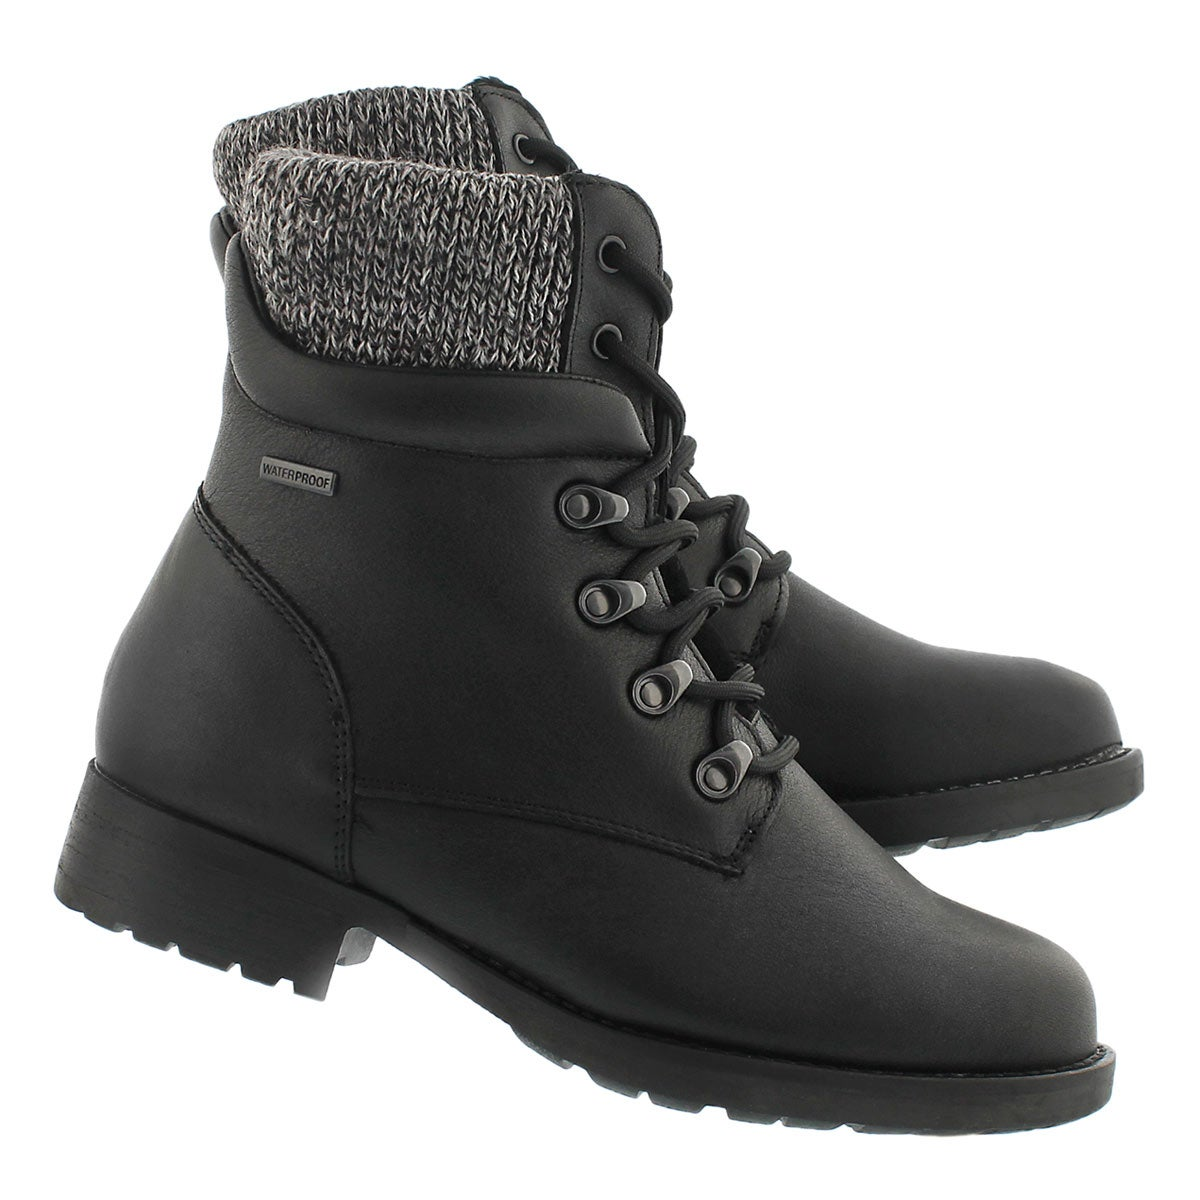 Lds Derry black wtpf winter boot